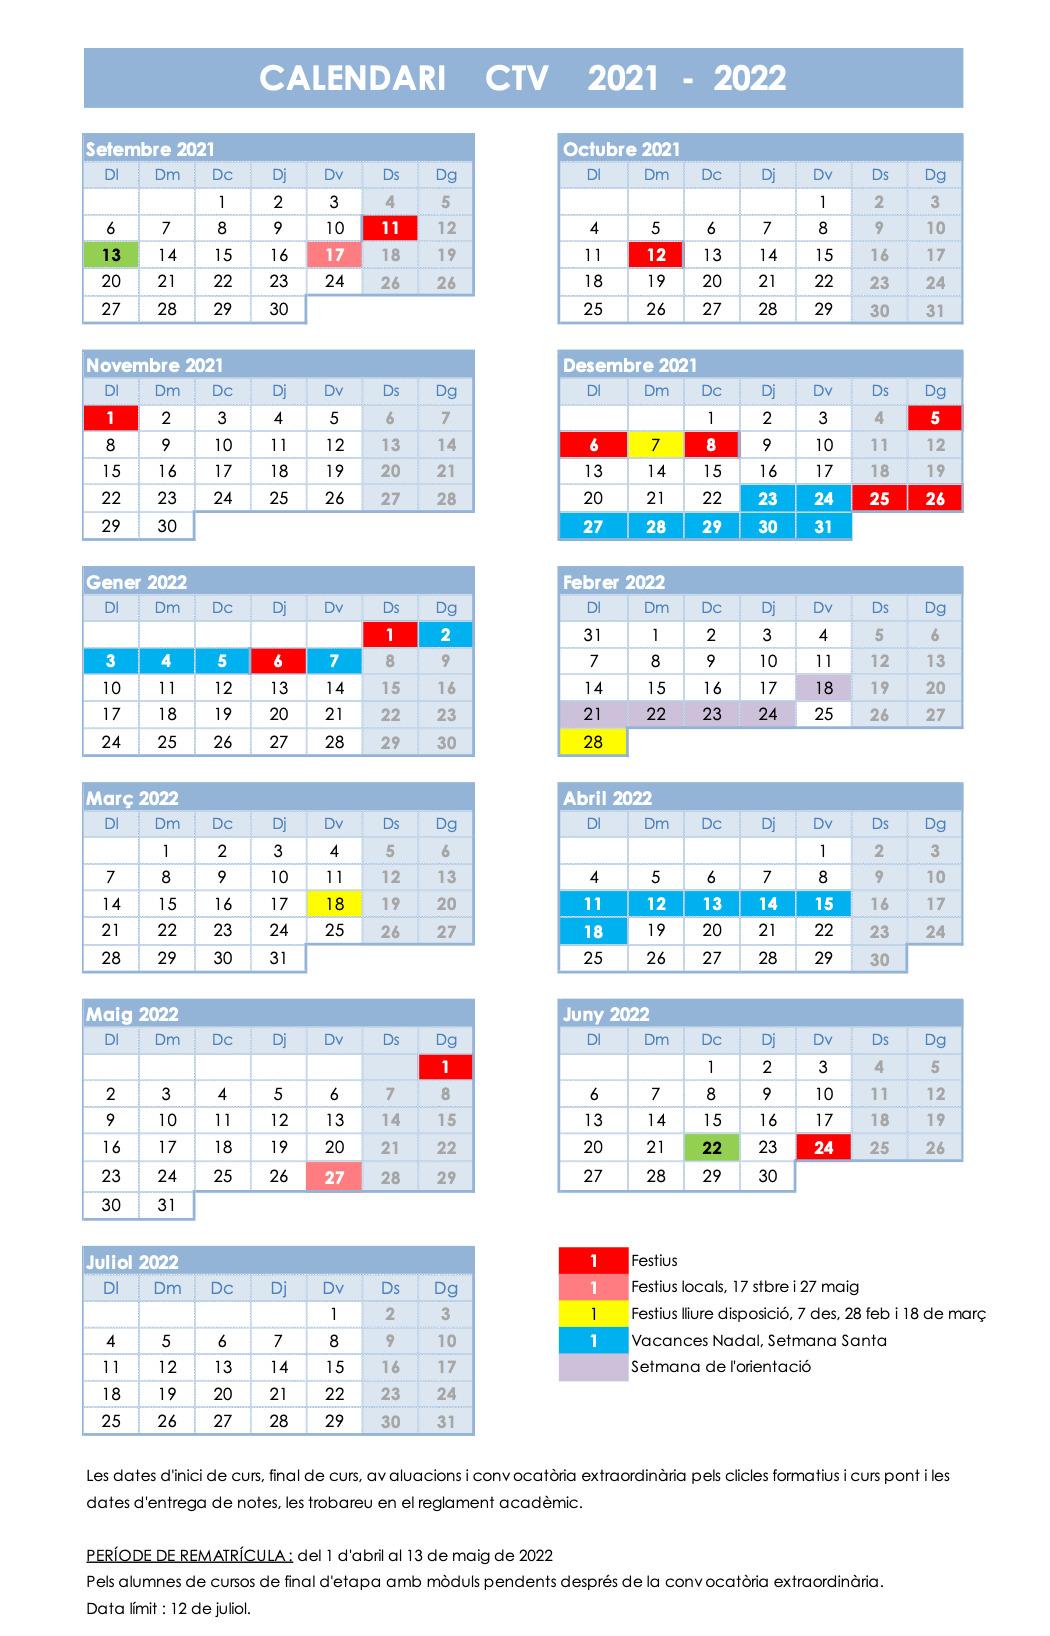 CALENDARI ESCOLAR CTV CURS 2021-2022